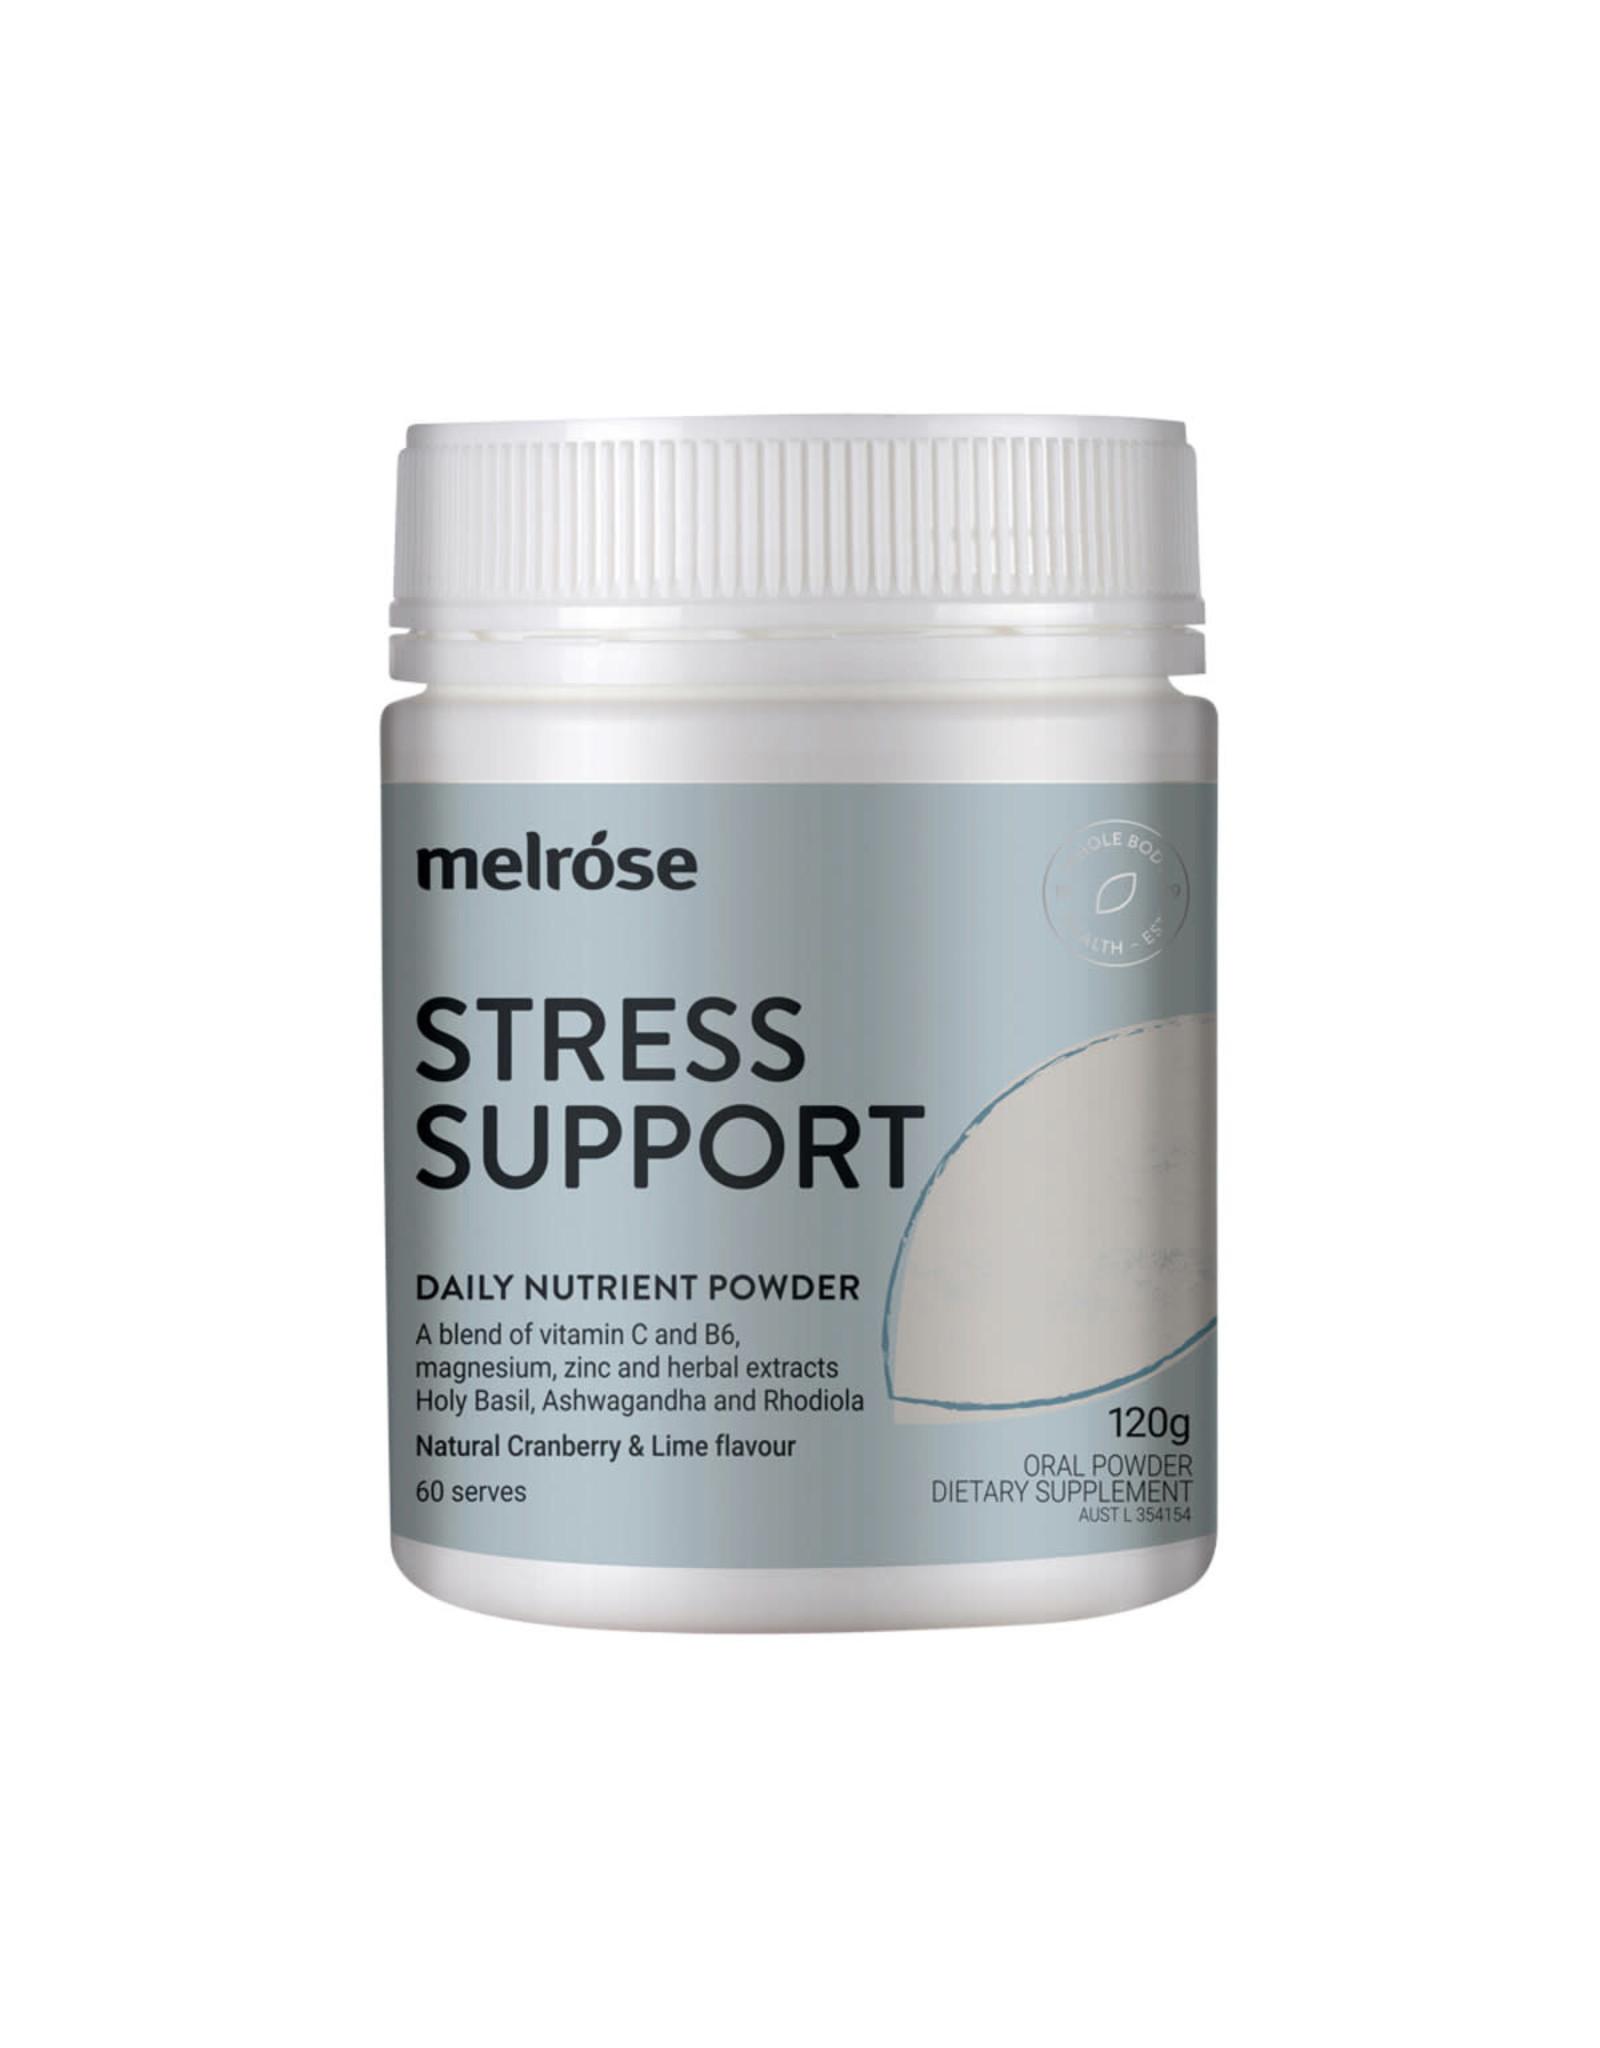 Melrose Stress Support Powder 120g